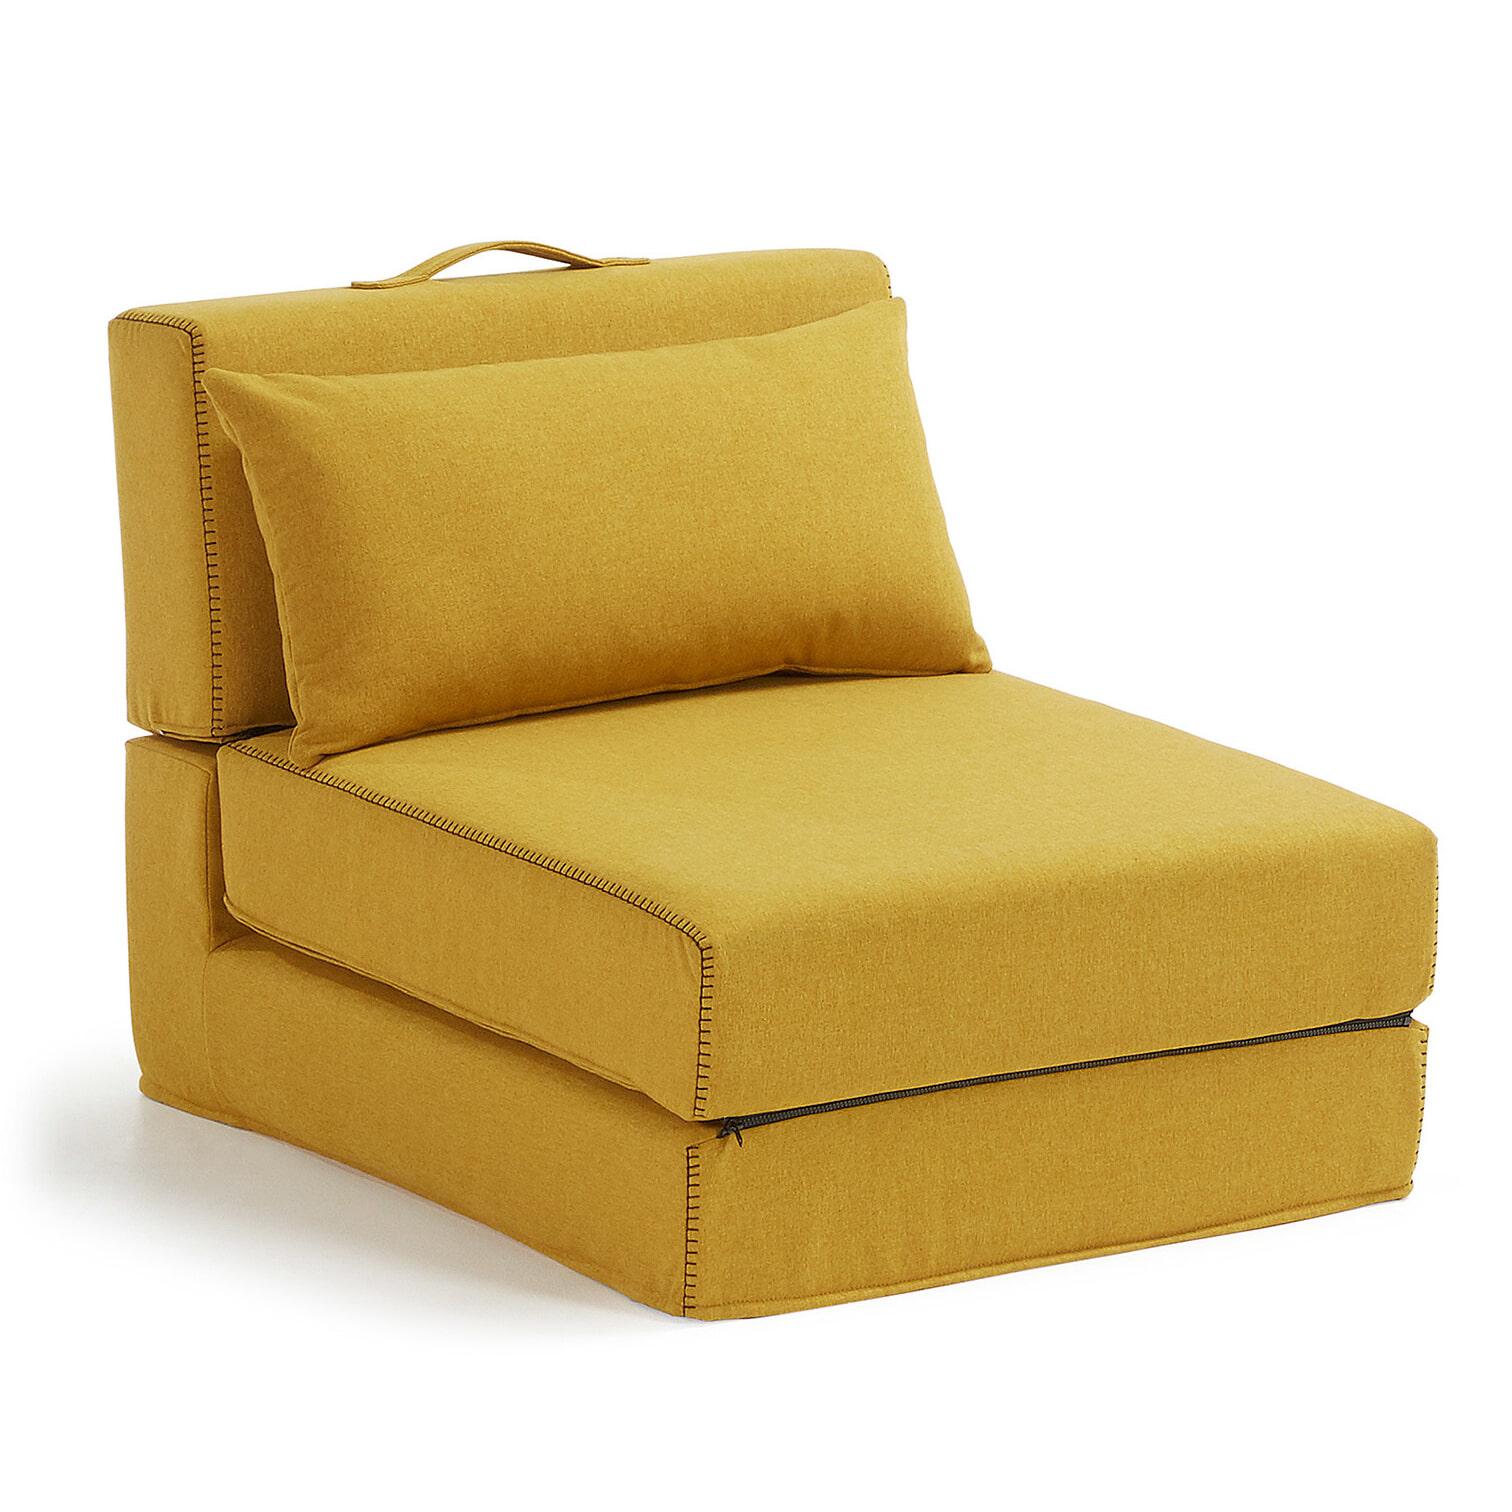 Kave Home Vouwbed 'Arty' kleur geel